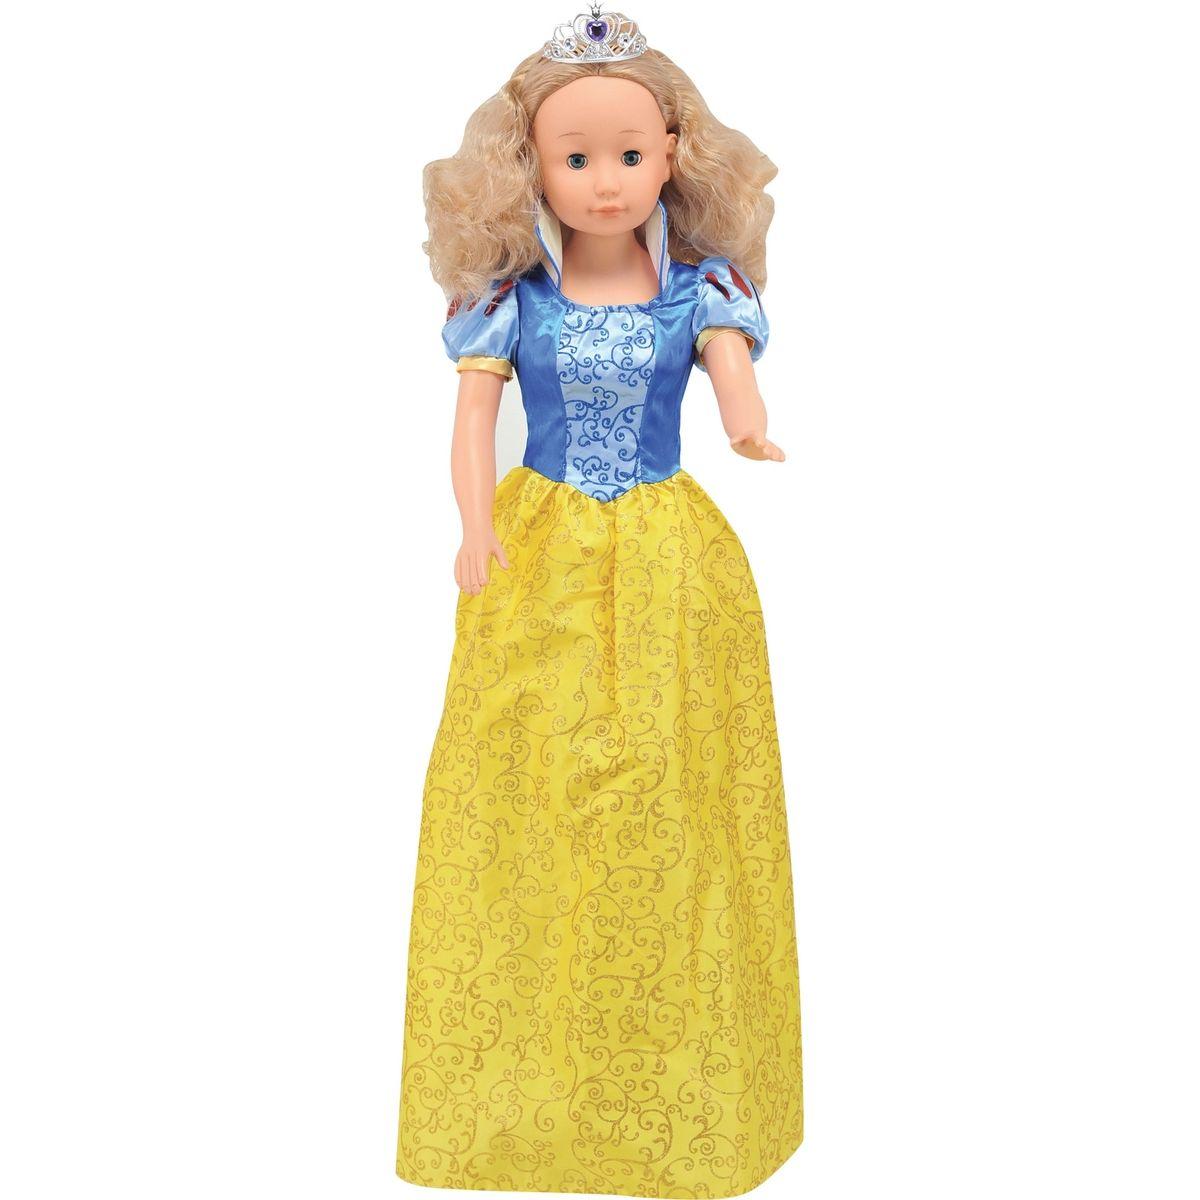 Dimian Panenka Bambolina Molly princezna 90cm Žluto-modré šaty